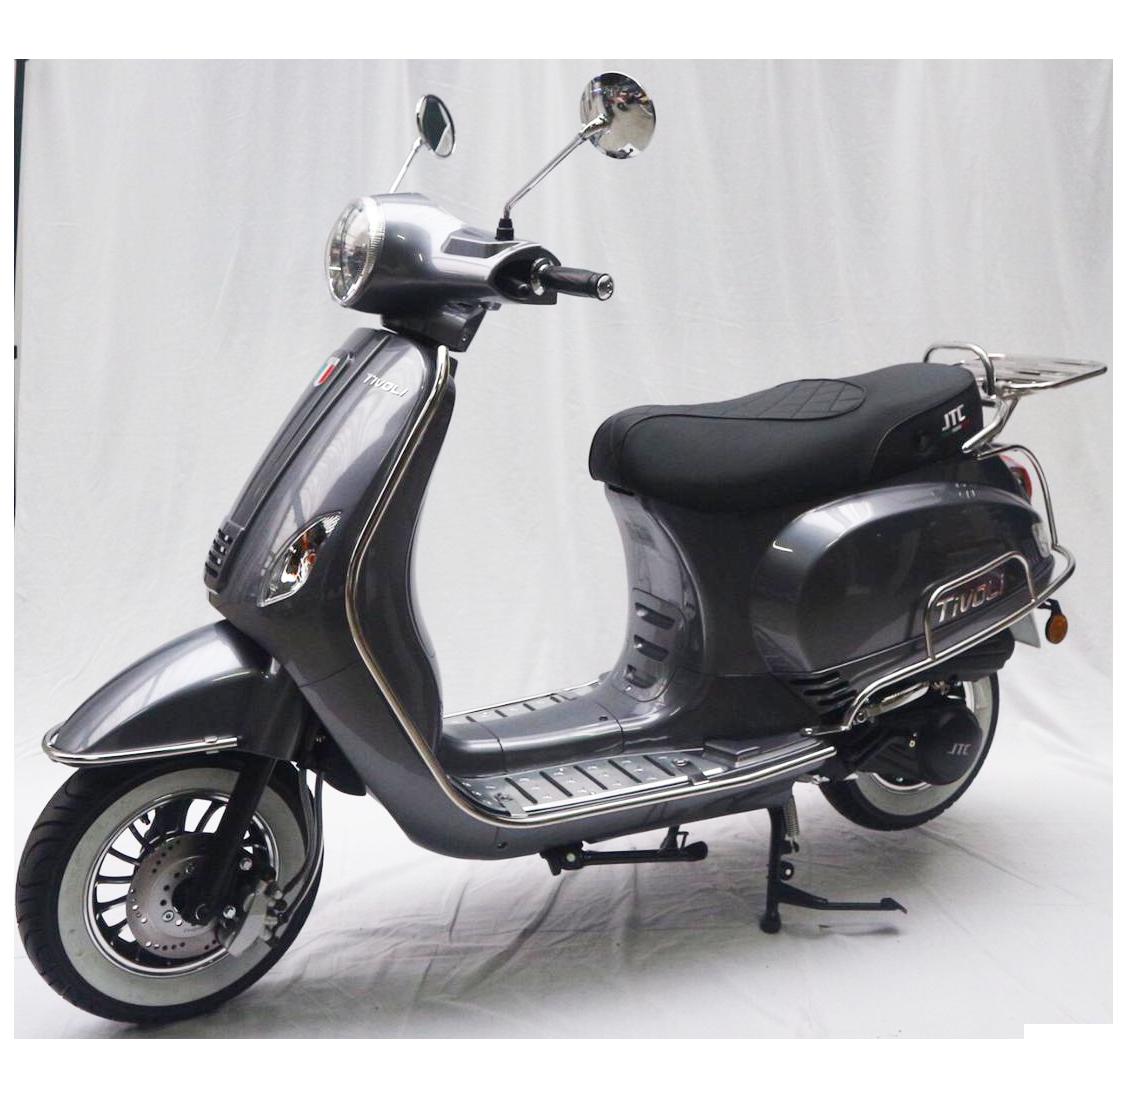 JTC Tivoli antraciet 125 cc